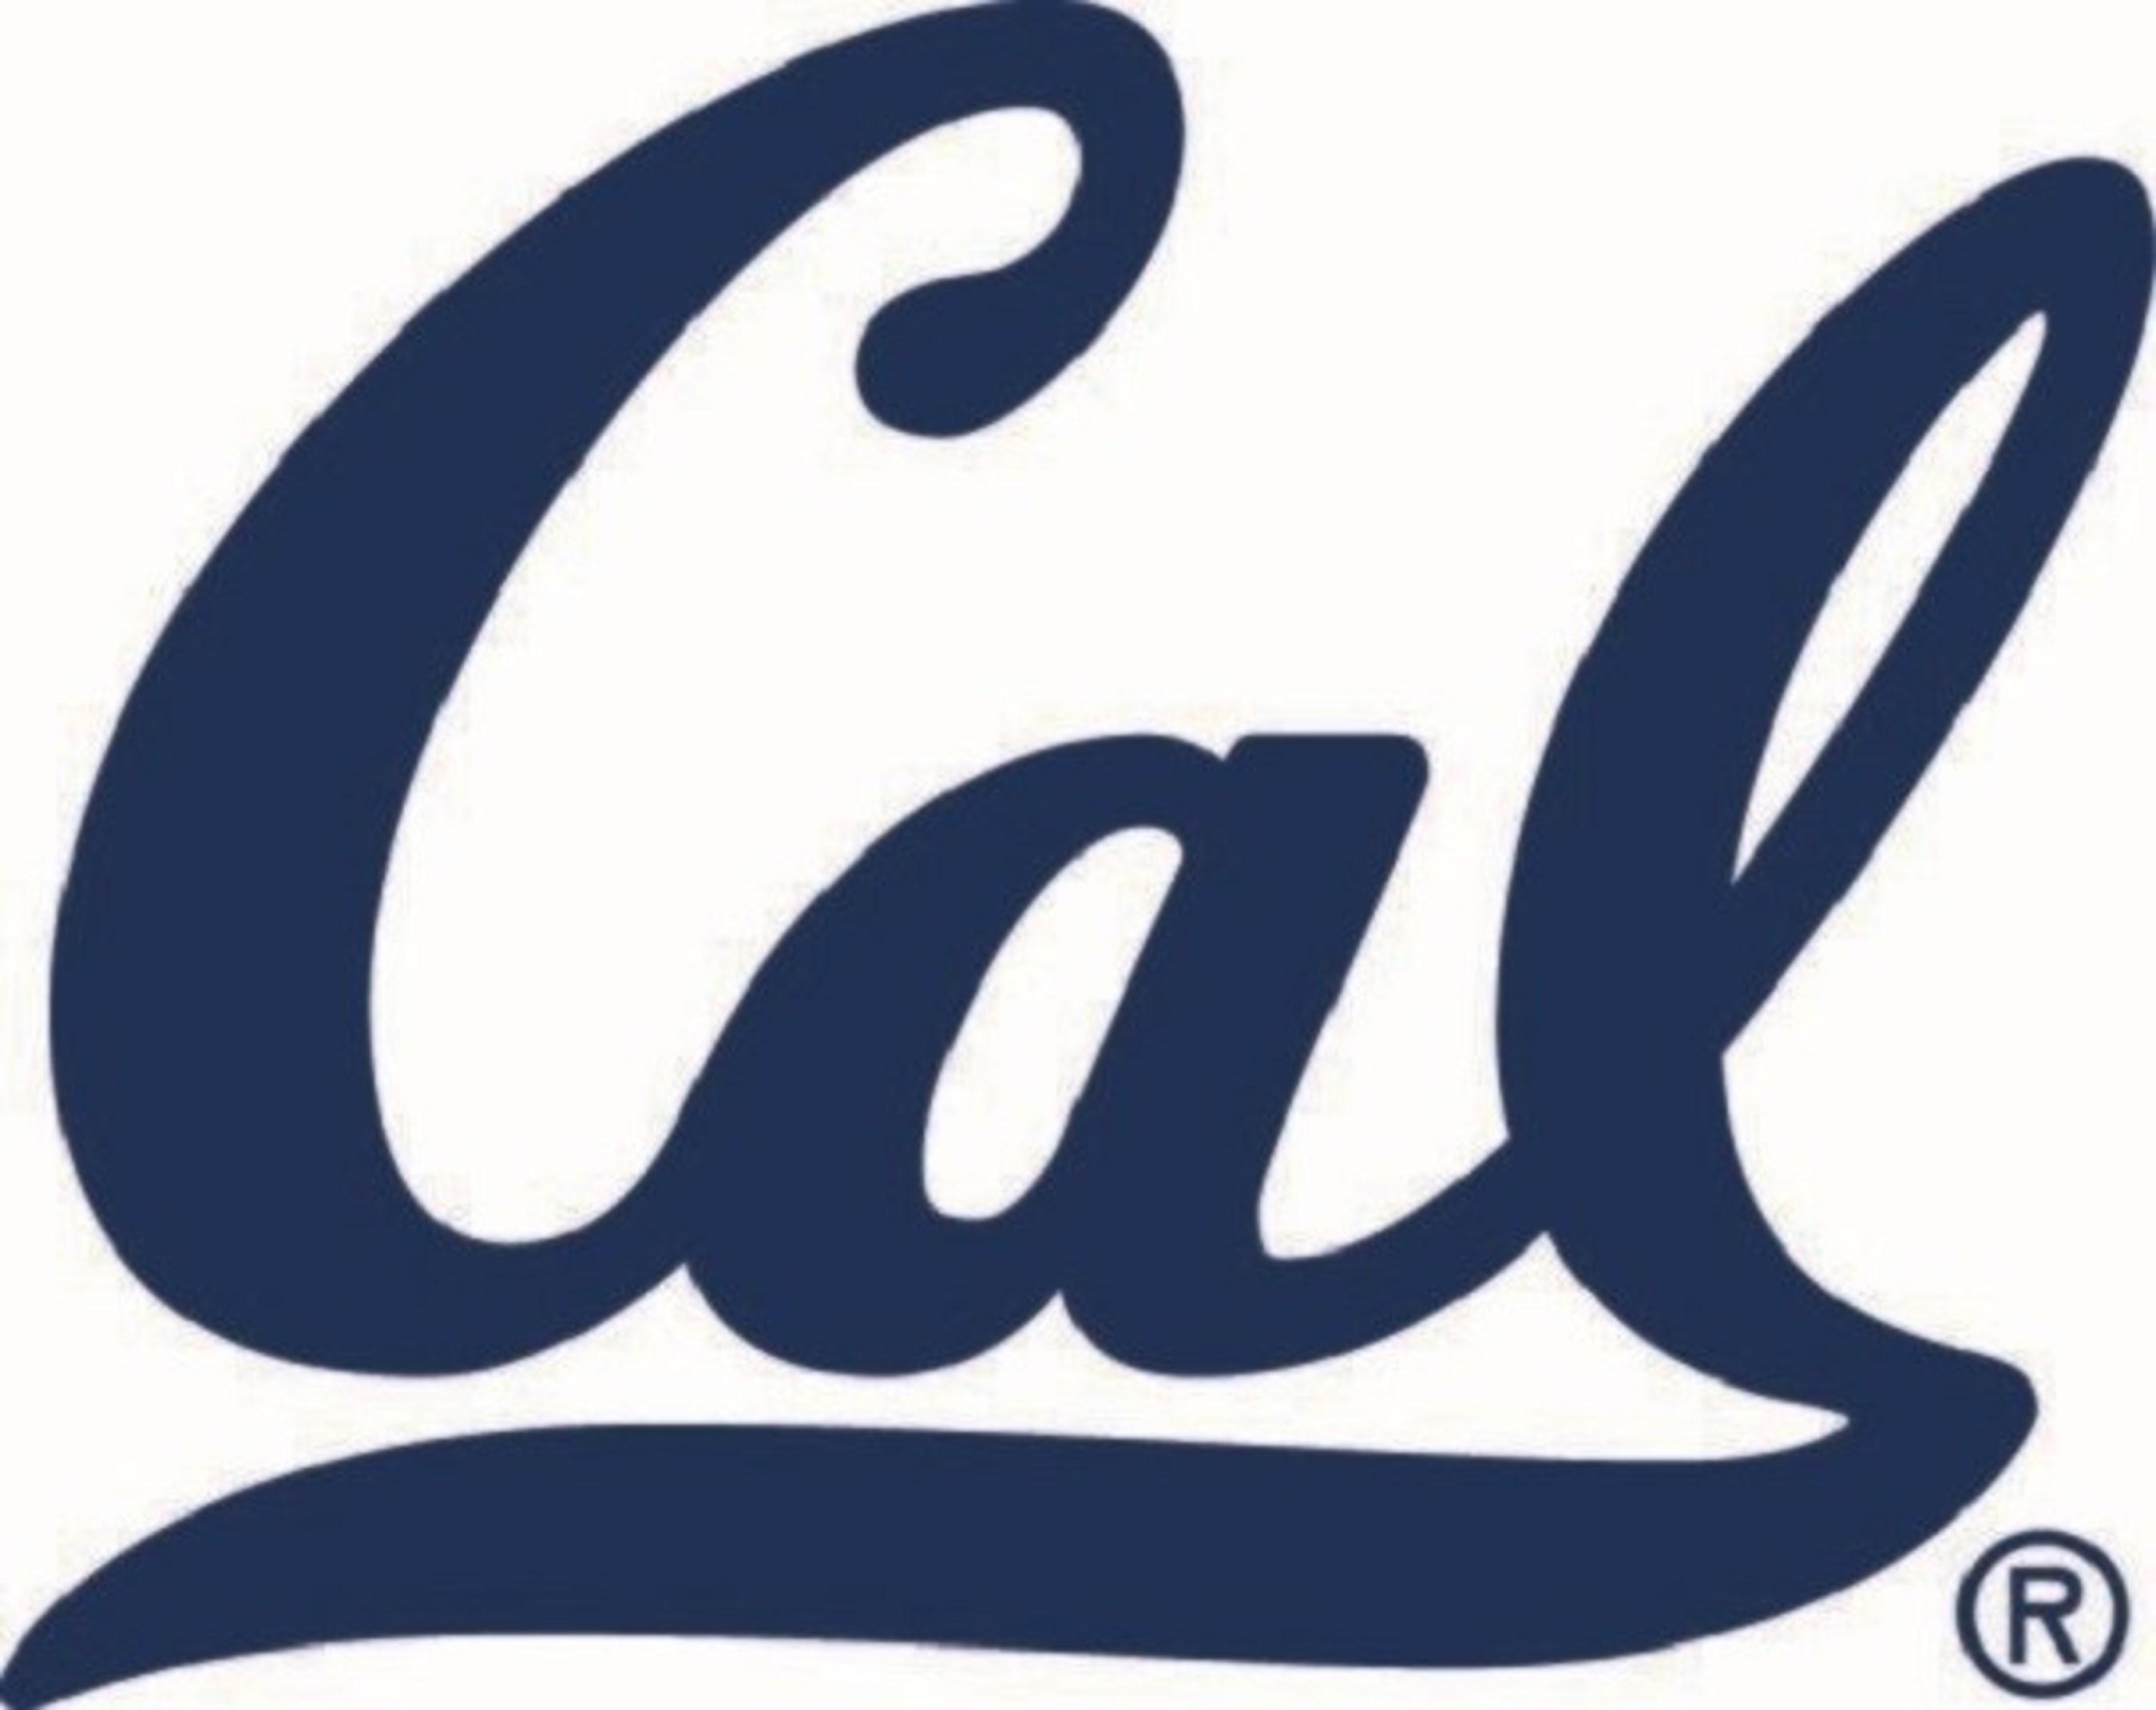 The University of California, Berkeley logo